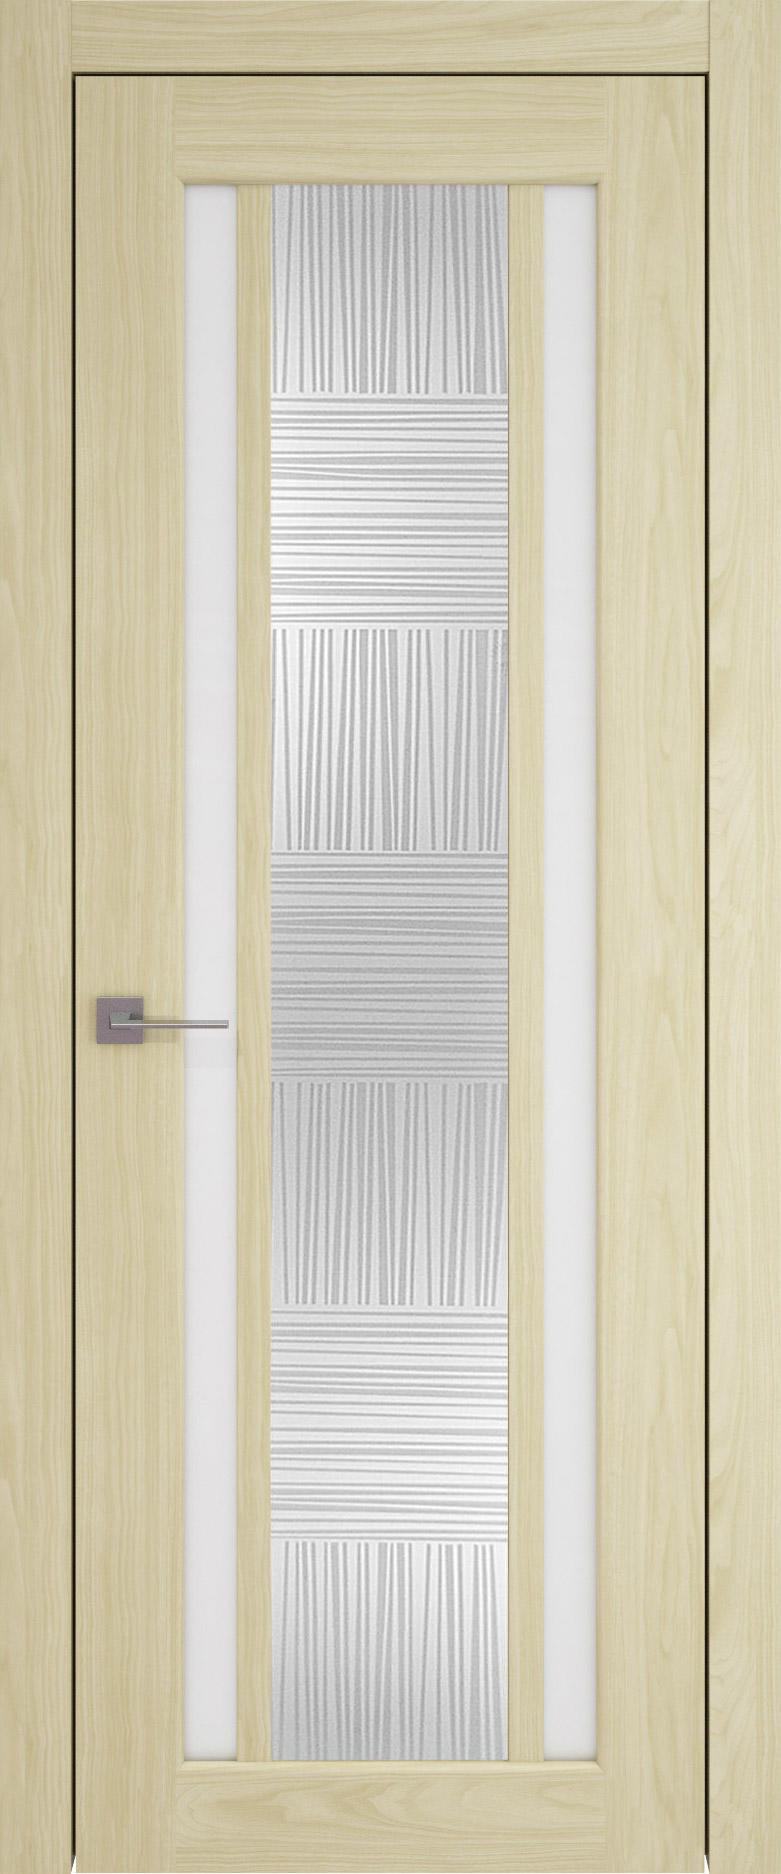 Palazzo цвет - Дуб нордик Со стеклом (ДО)